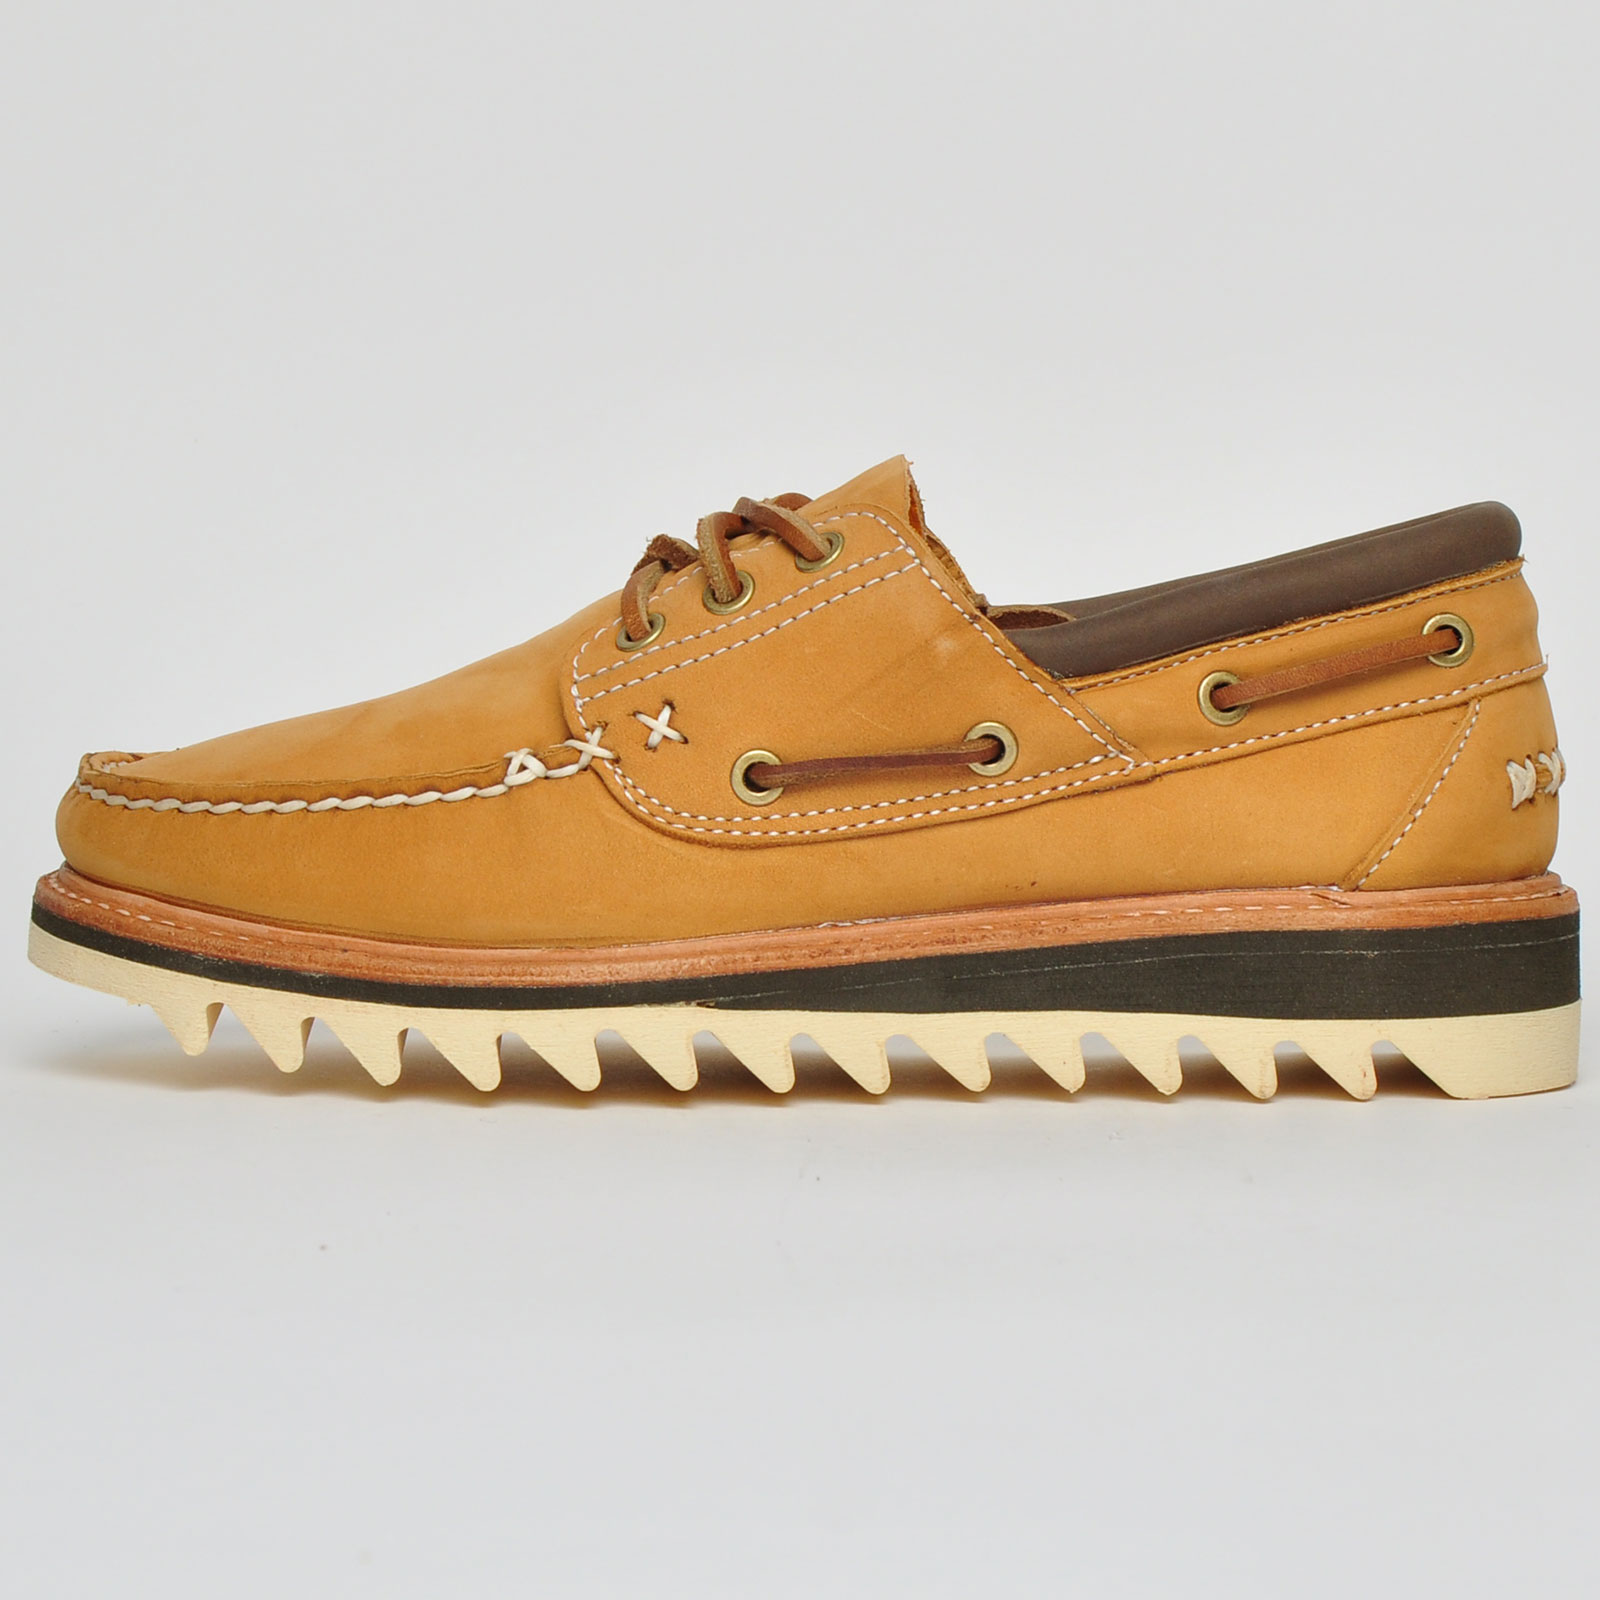 Detalles de Timberland Selbyville 3 Ojo Cuero Hombre Zapatos Náuticos